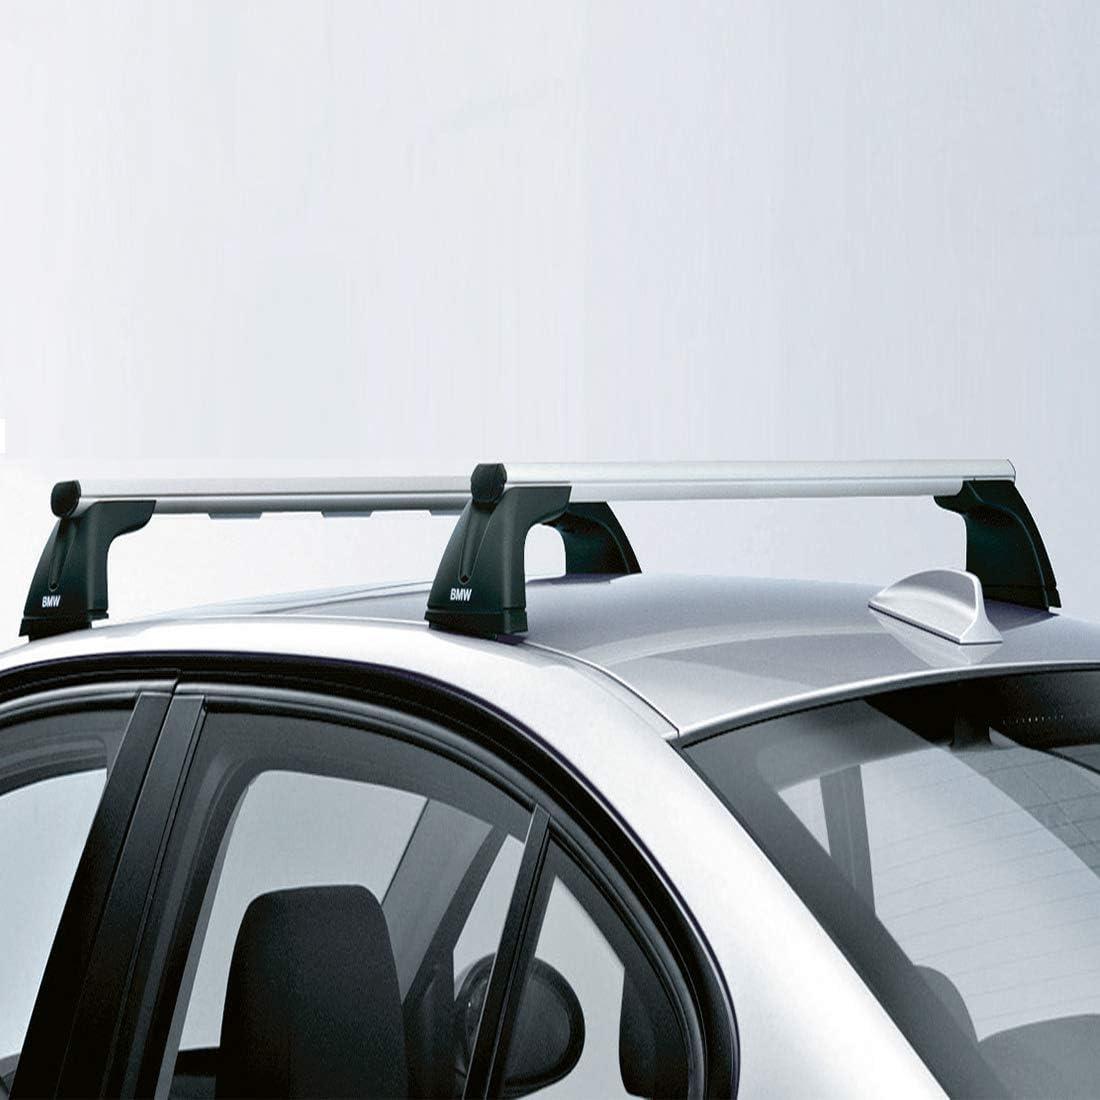 Amazon Com Bmw Roof Rack Base Support System 325 328 330 335 M3 Sedan 2006 2011 Automotive